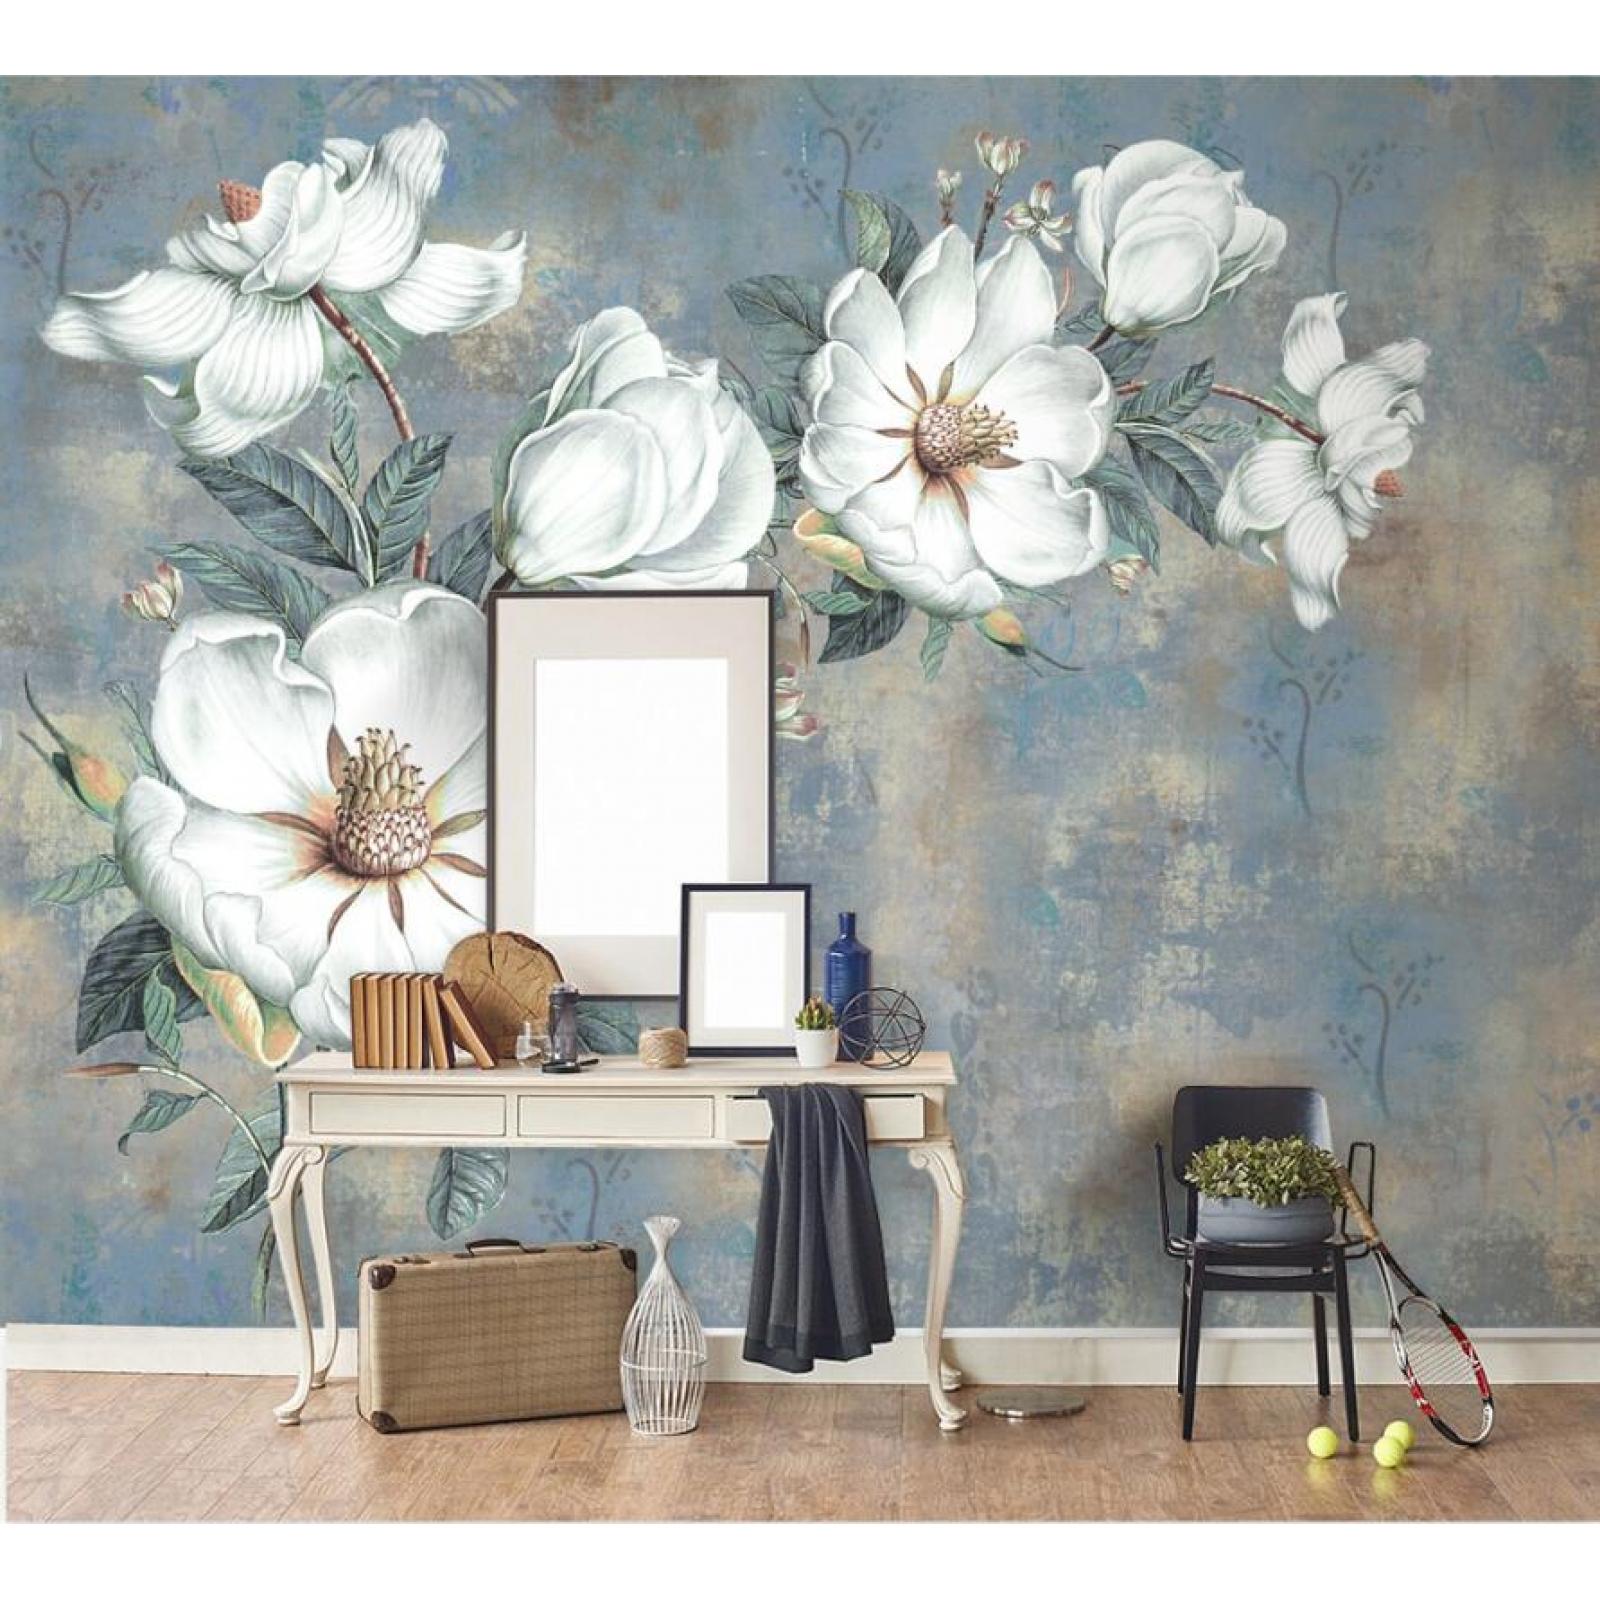 Flower Wall Mural Painting - HD Wallpaper